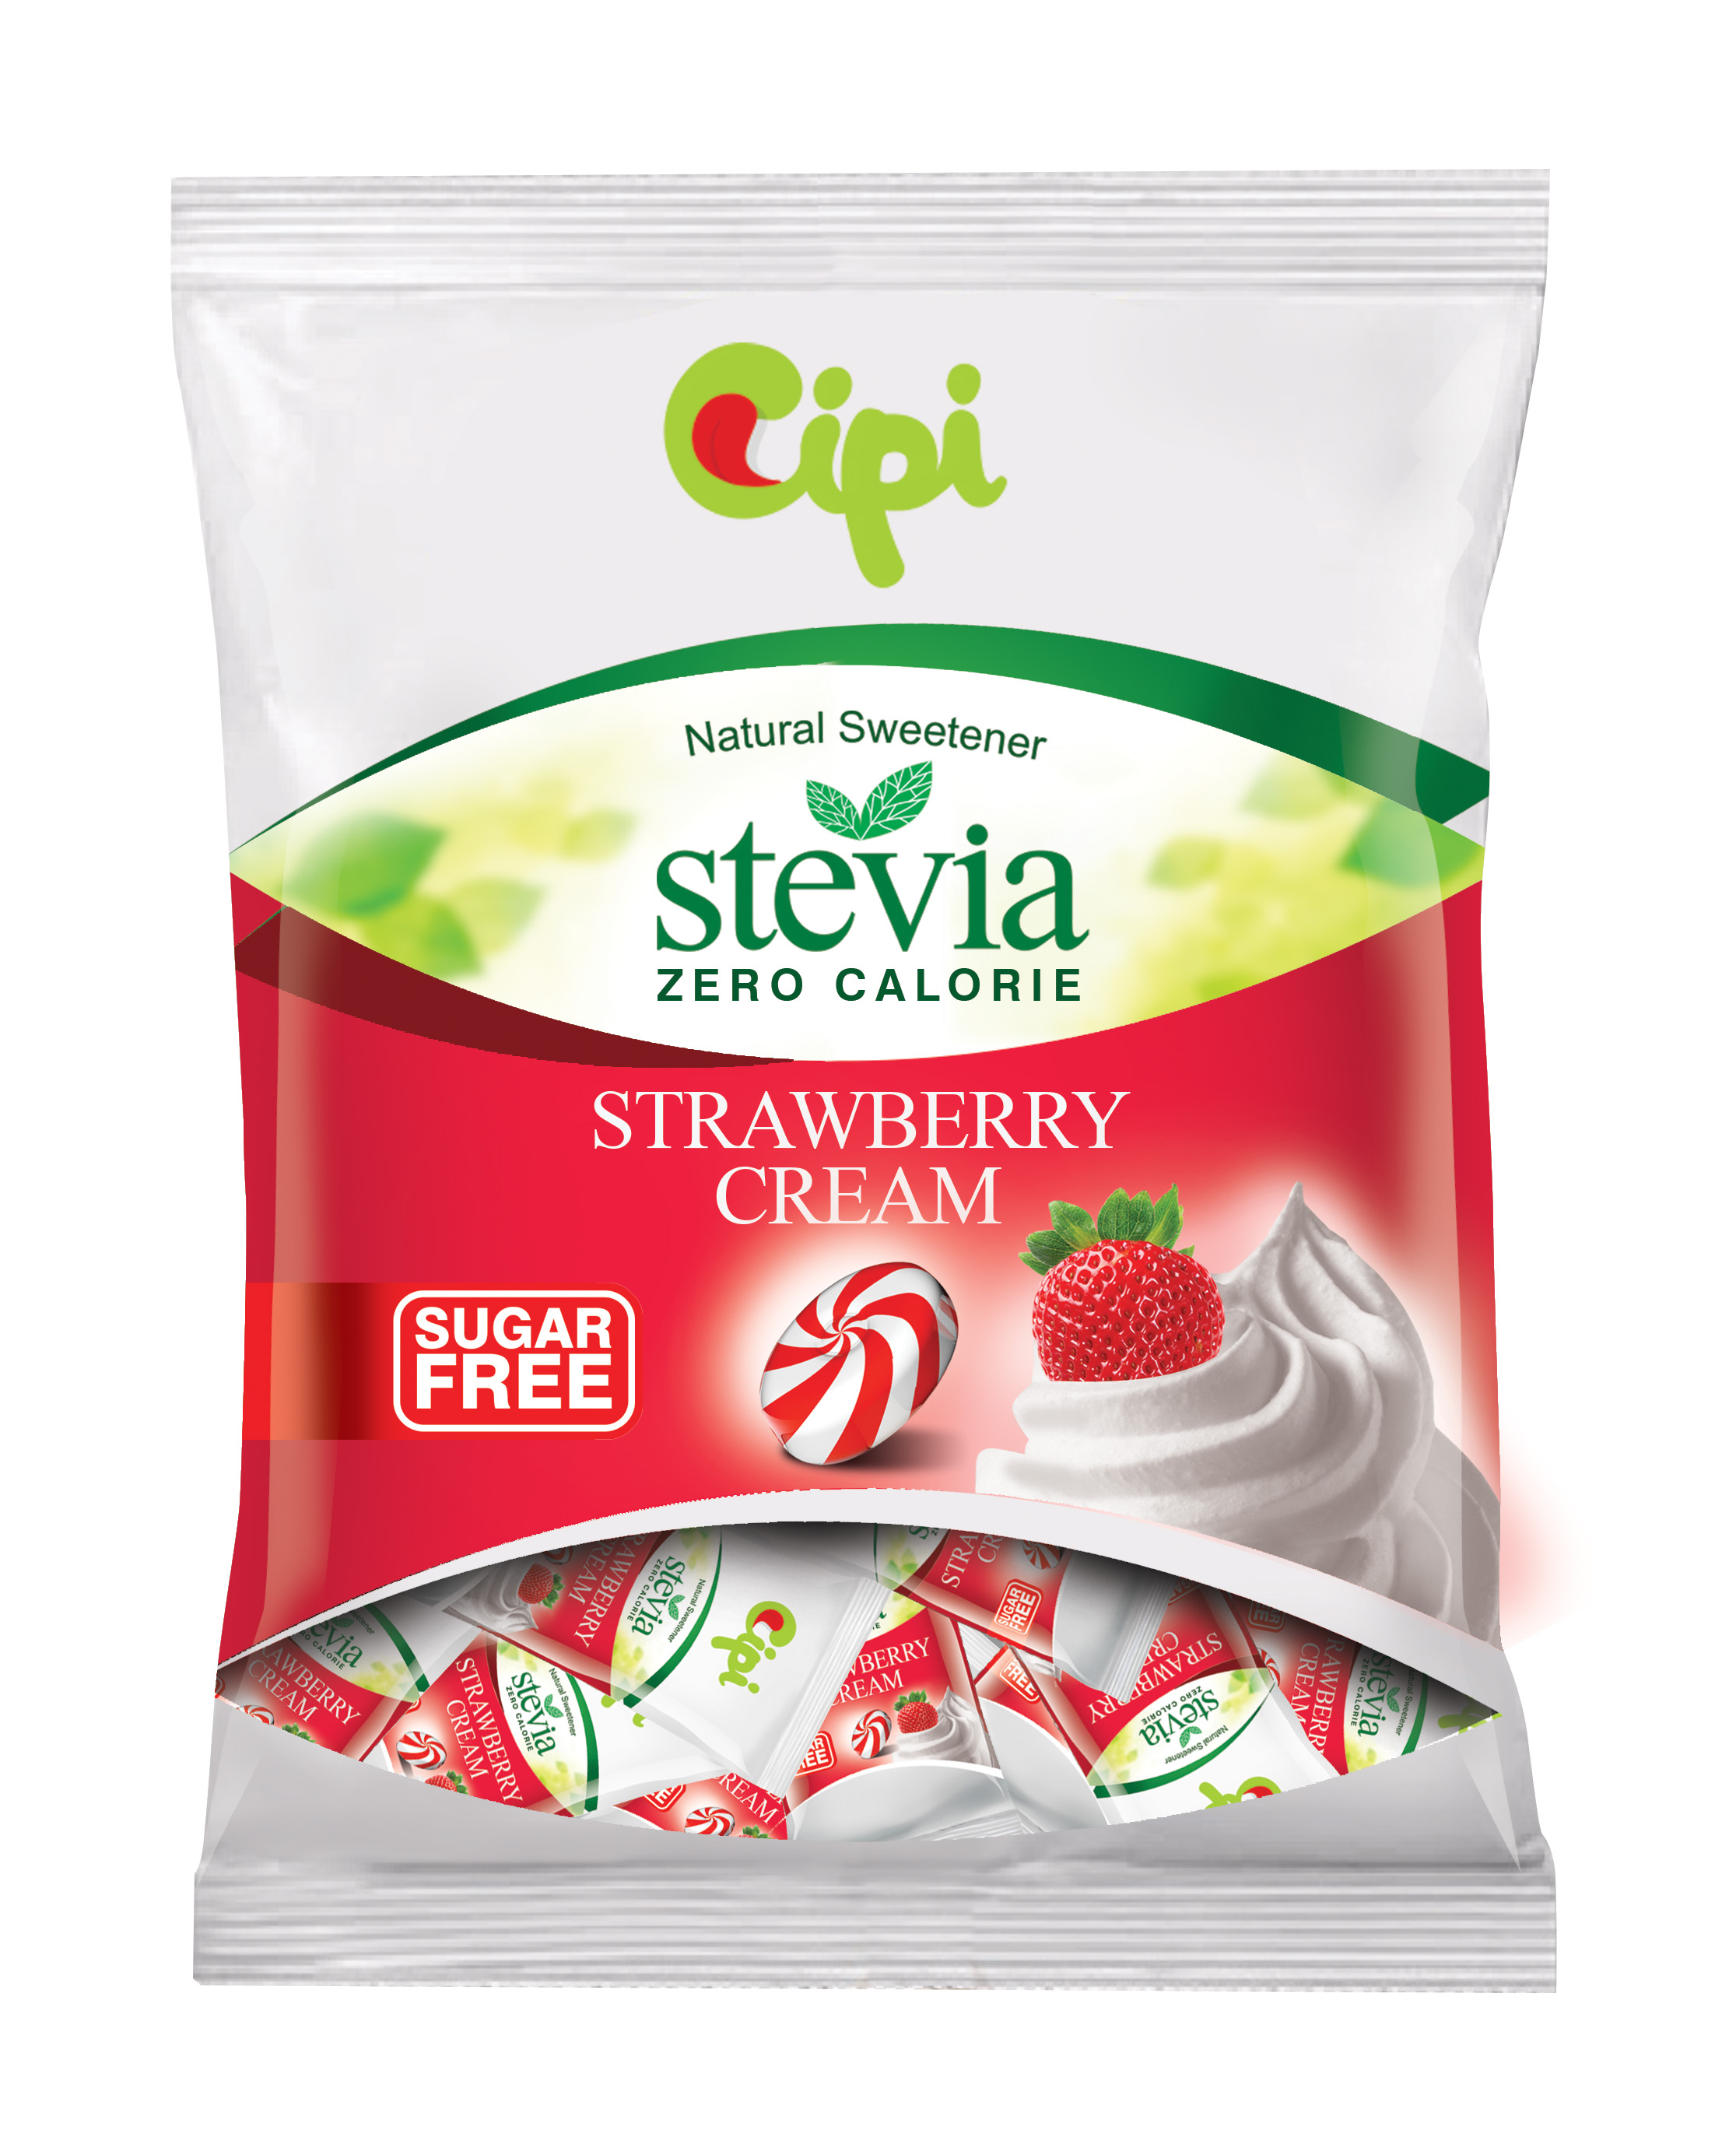 STEVIA sugar free Strawberry Cream Candies